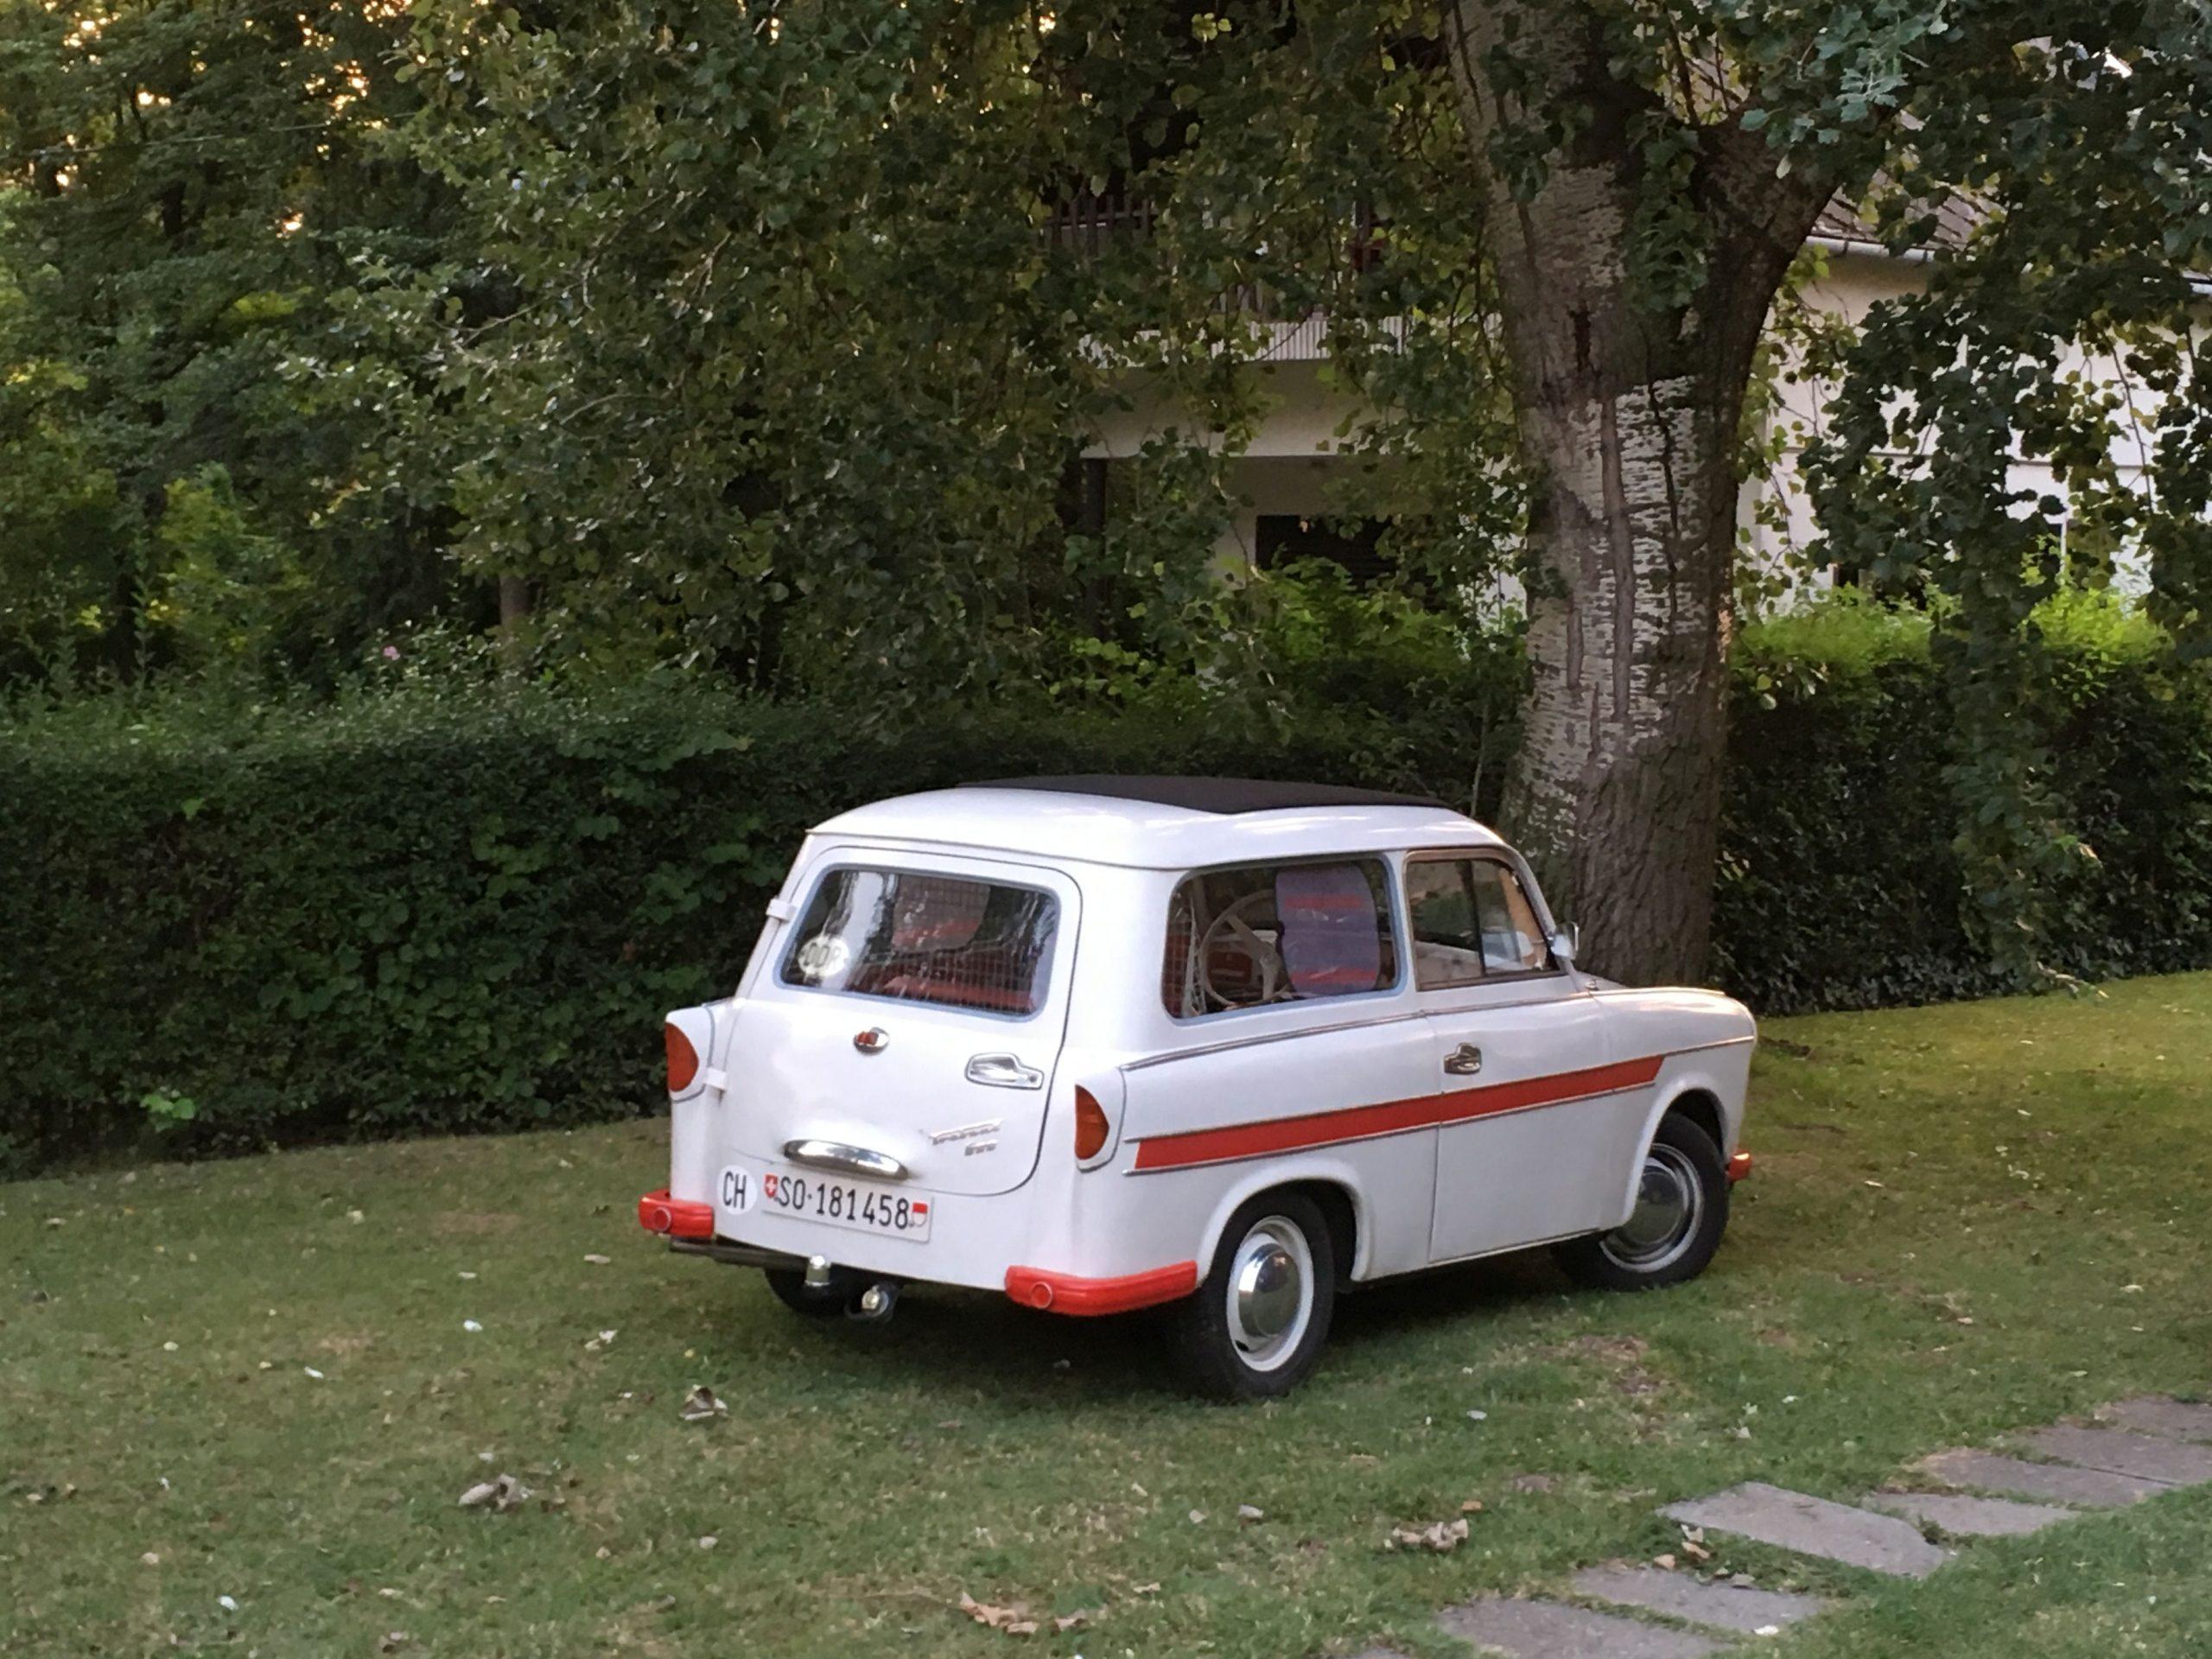 Trabant a kertben Balatonon.A nyaralók is szeretnek nosztalgiázni!A nyaralók is szeretnek nosztalgiázni!